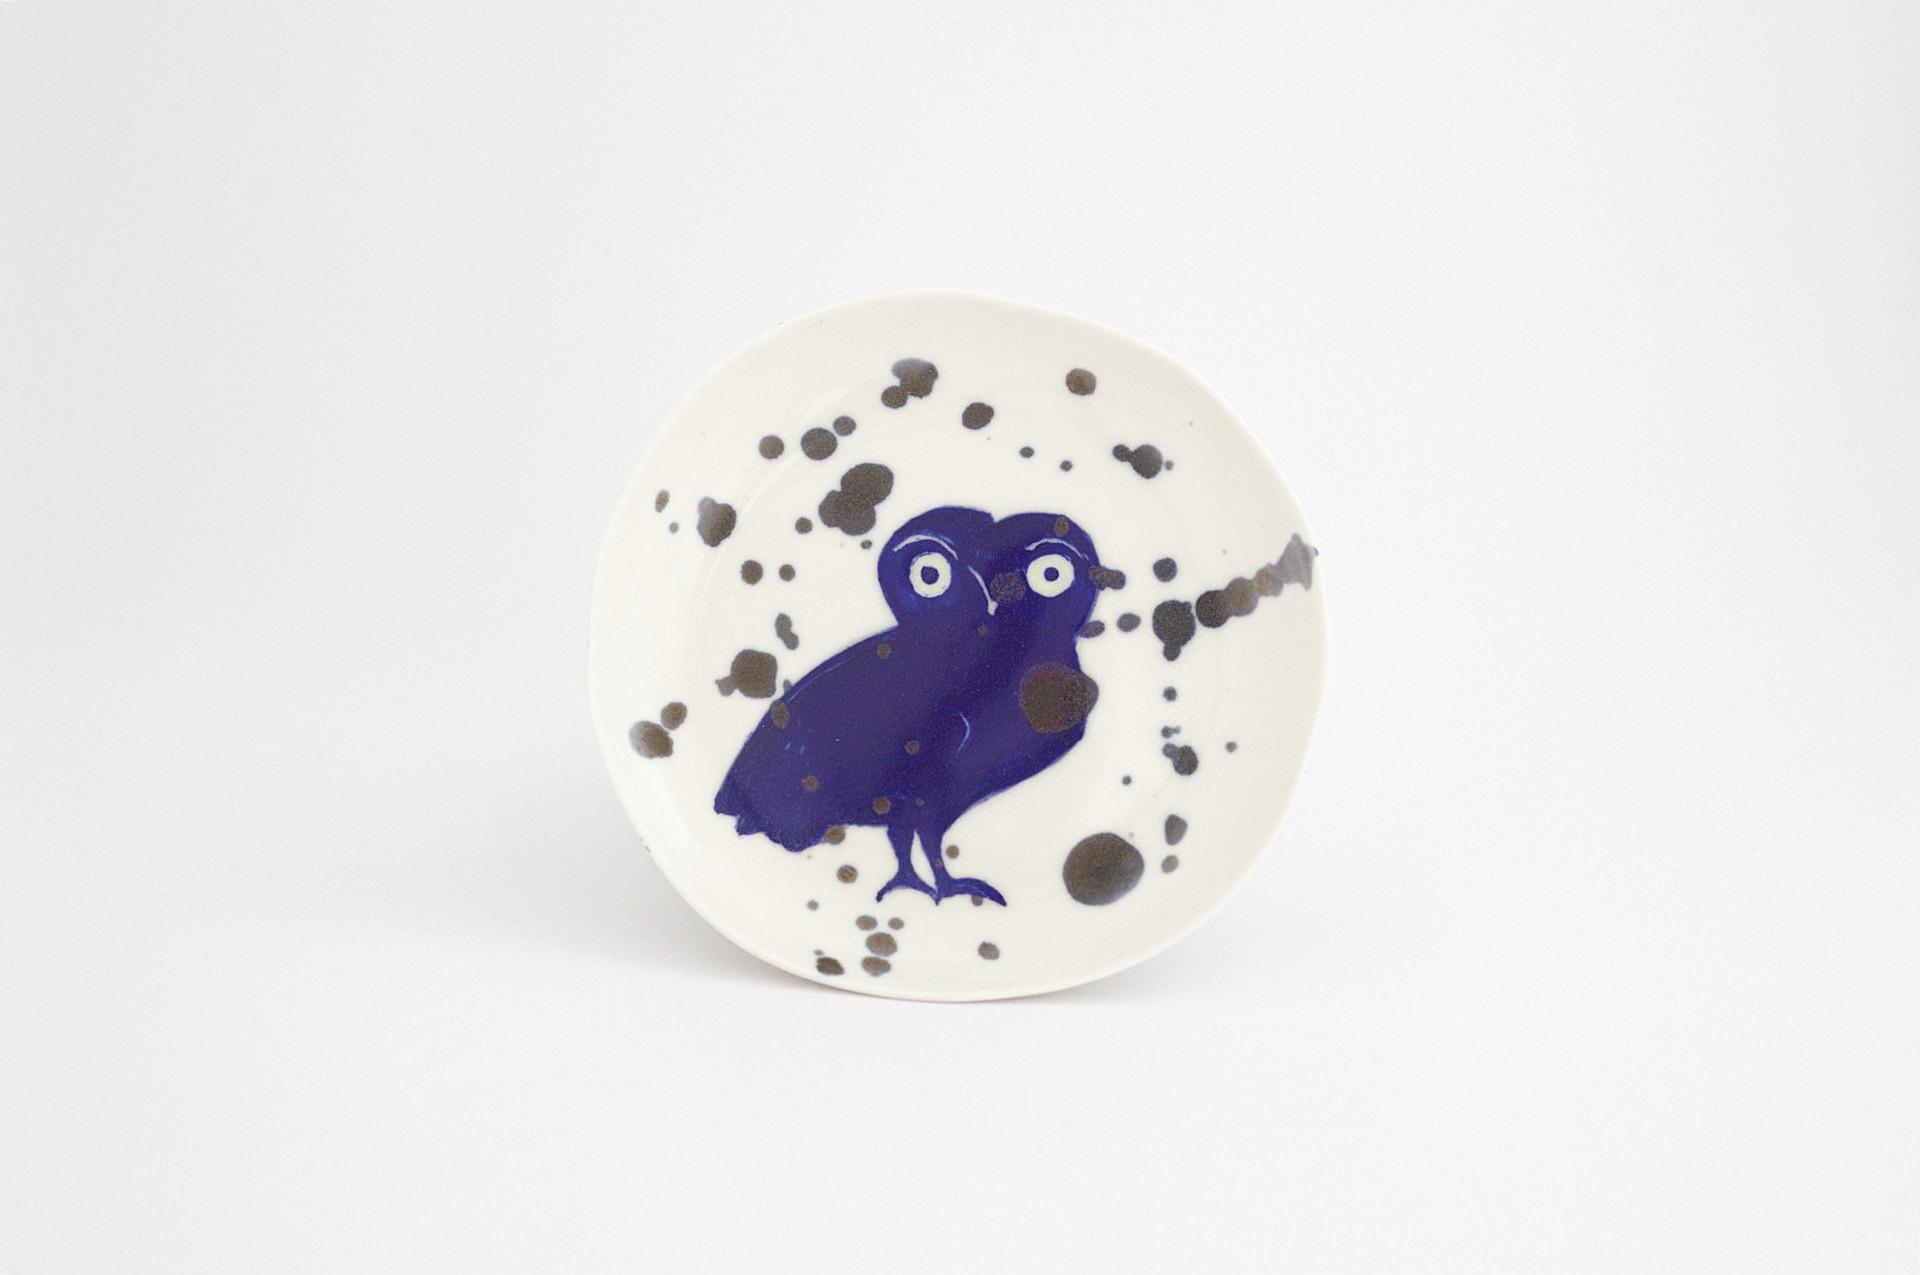 Owl Plate - 2018